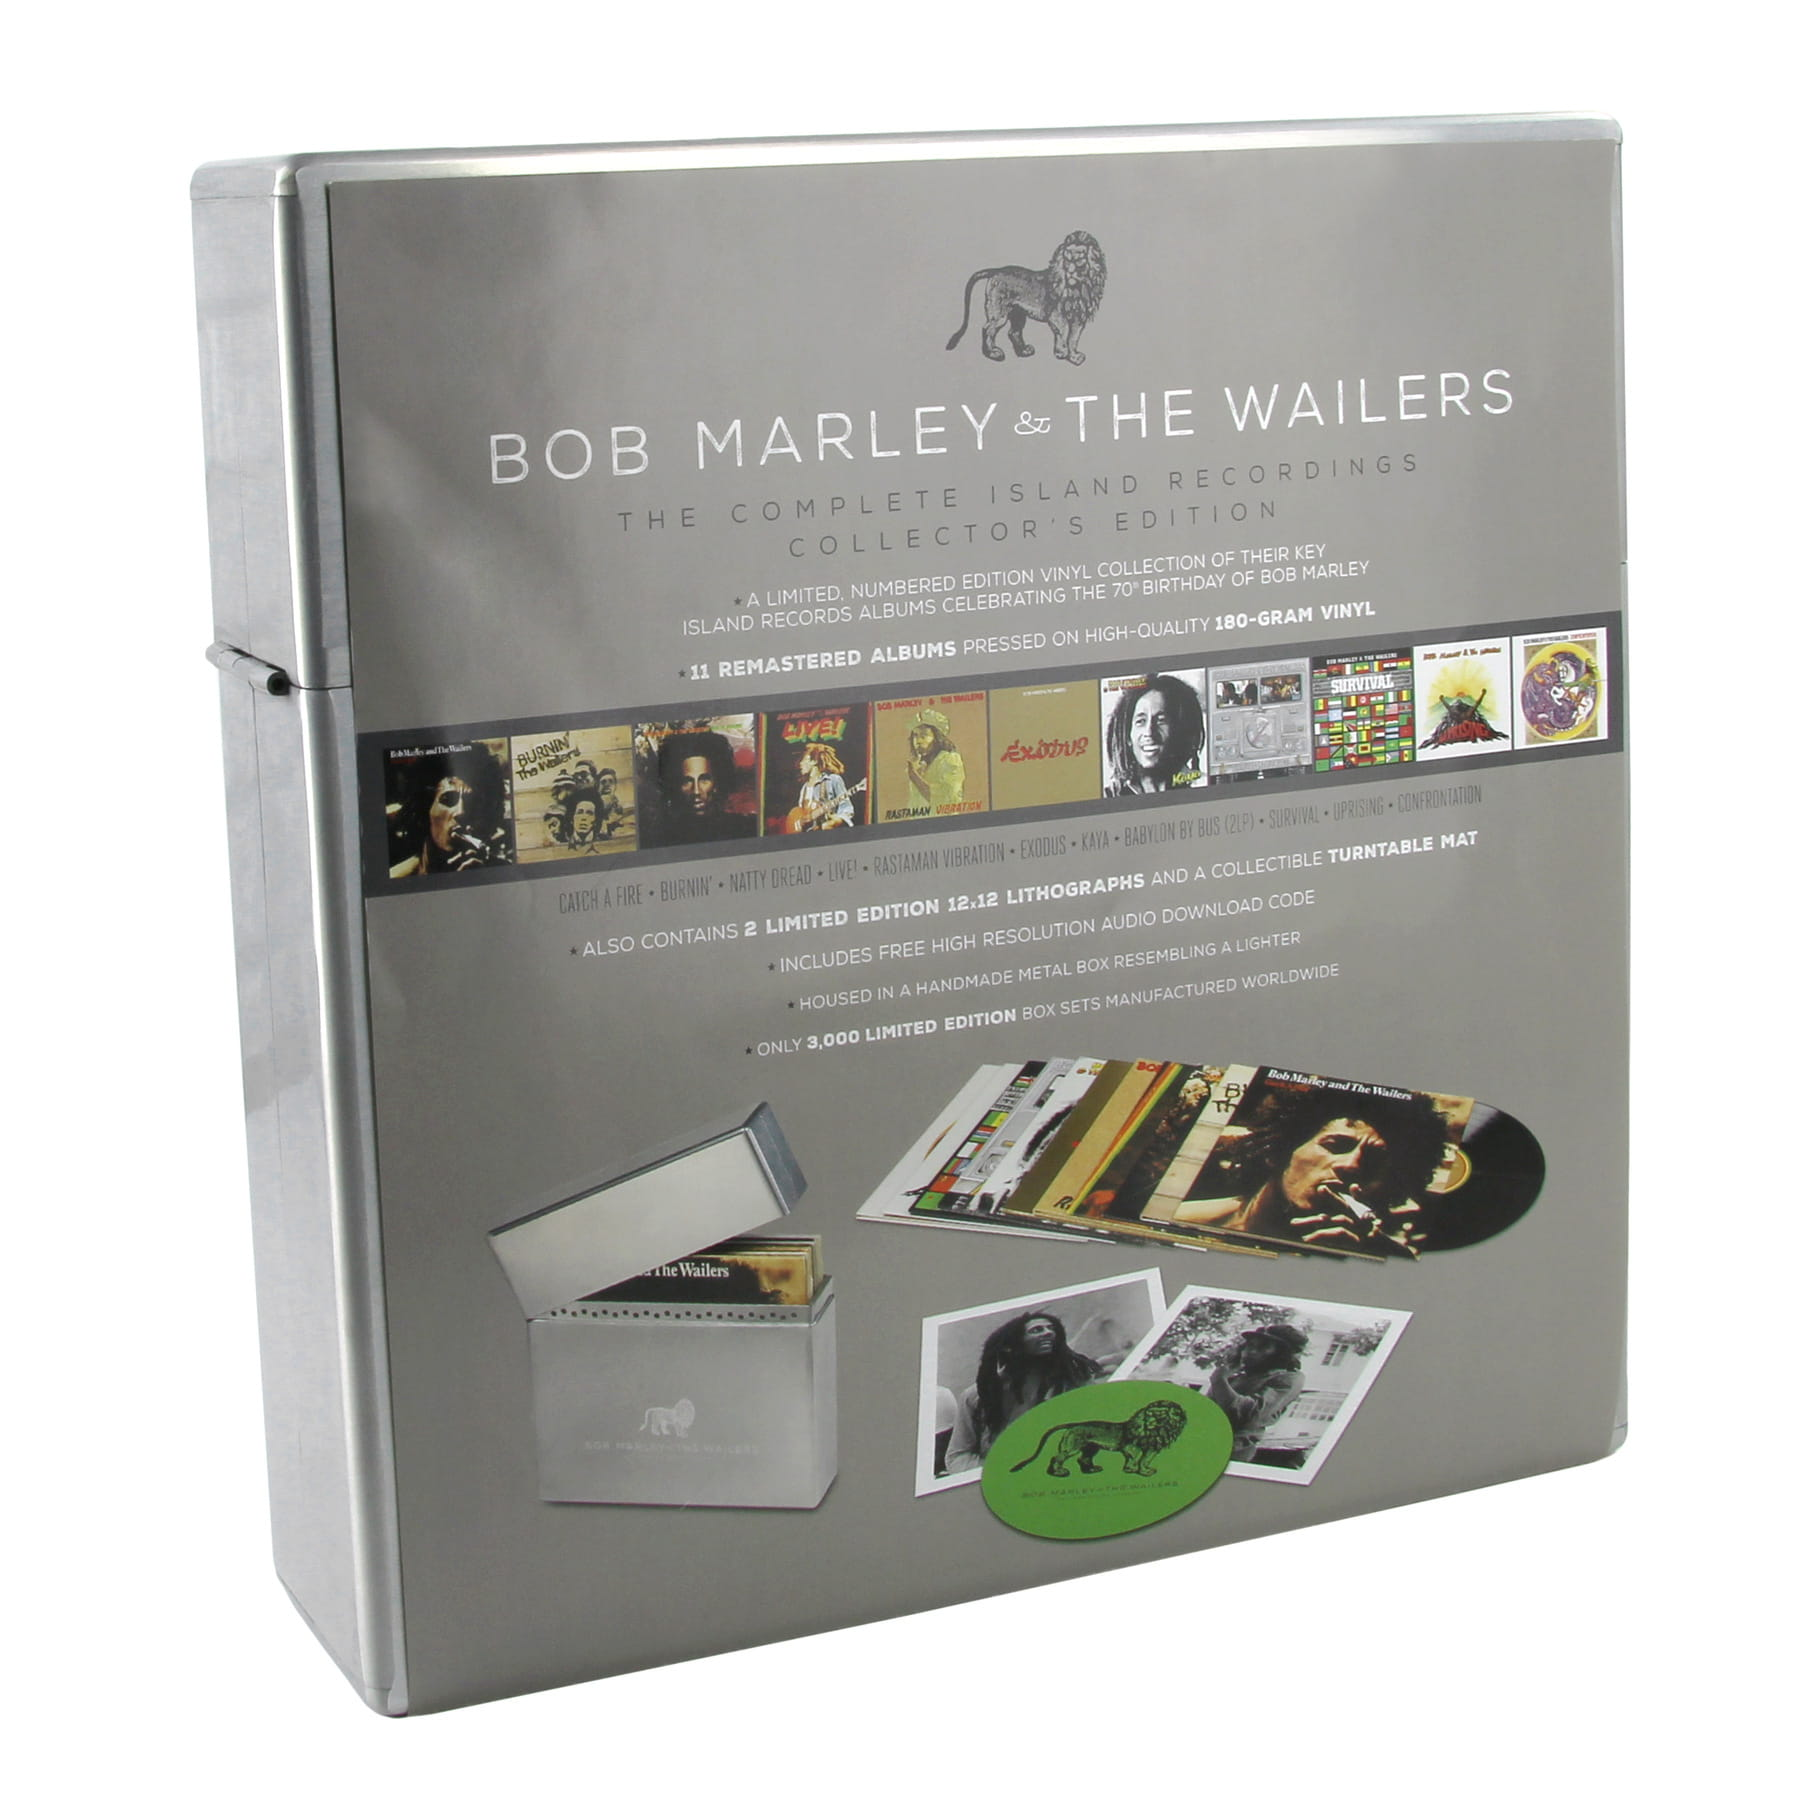 BOB MARLEY The Complete Island Recordings 12xLP METAL BOX Collectors Edition